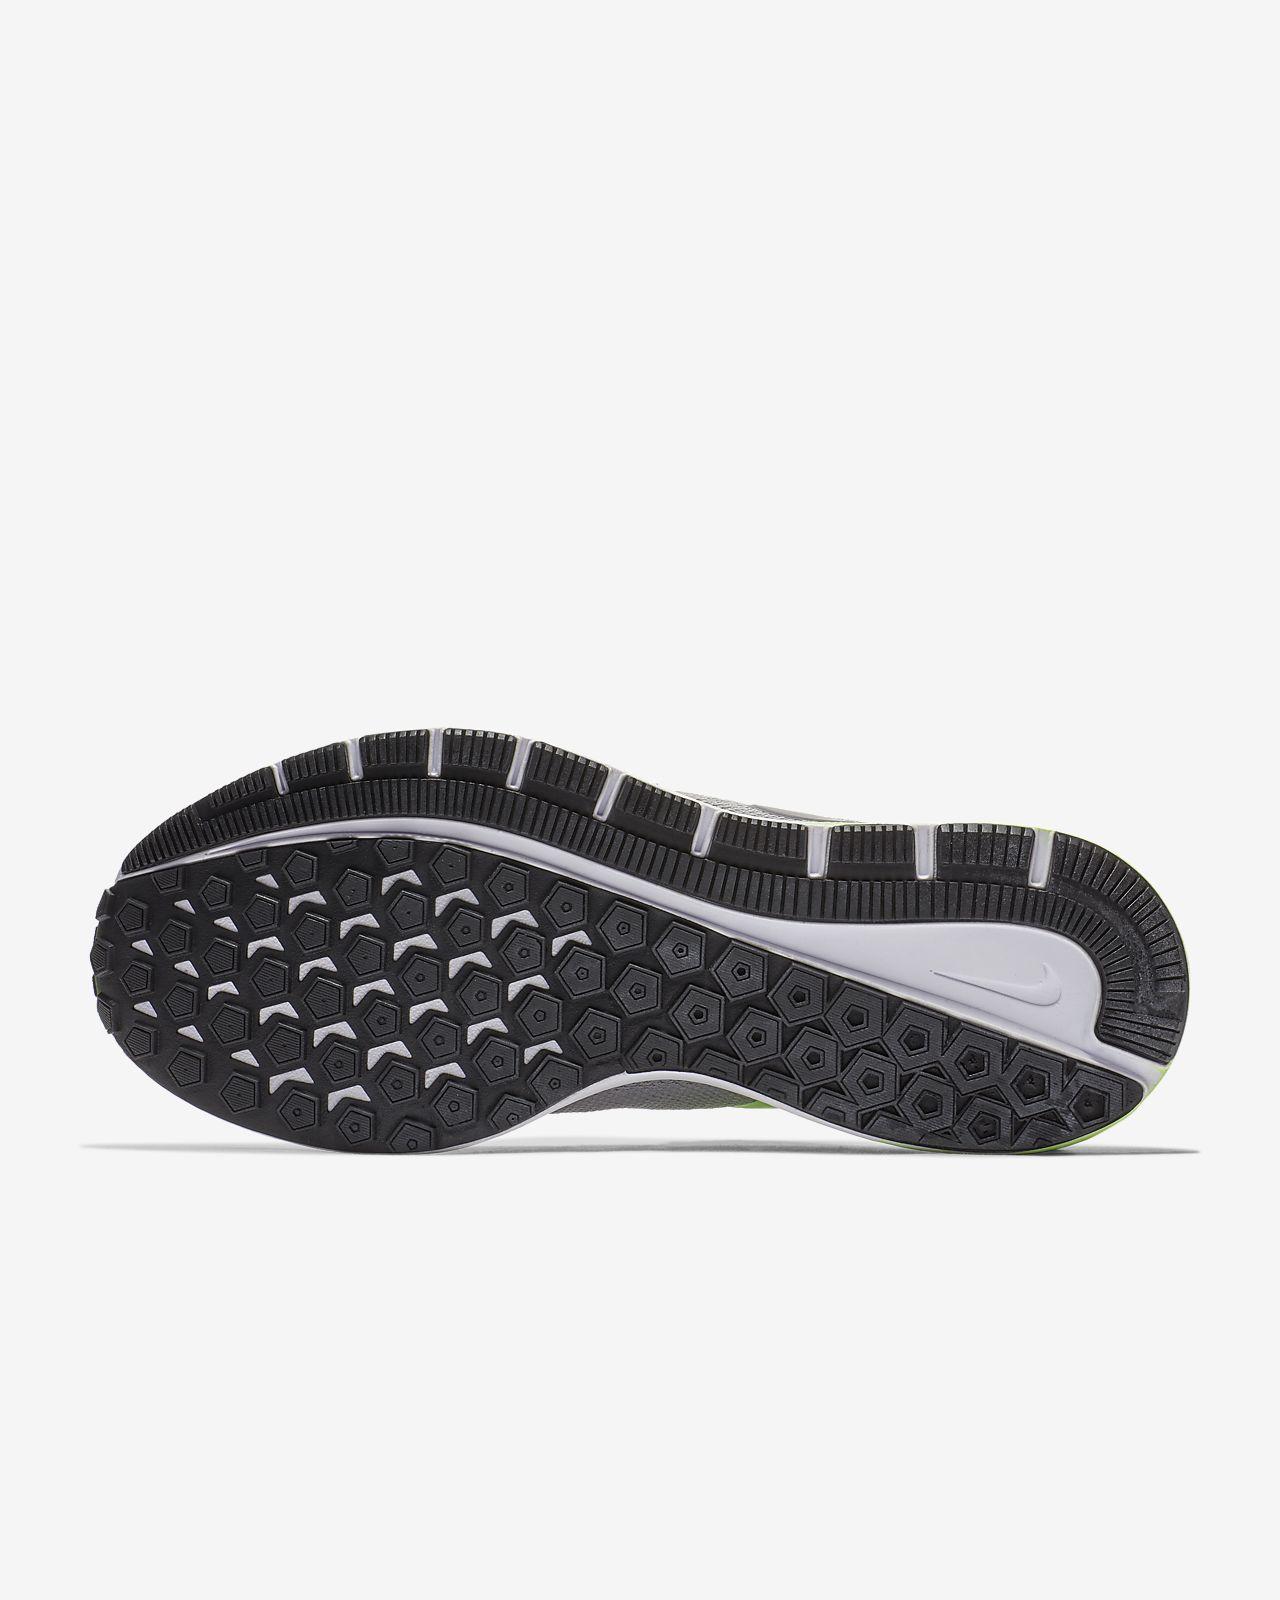 e1810ee4fe69 Nike Air Zoom Structure 22 Men s Running Shoe. Nike.com GB